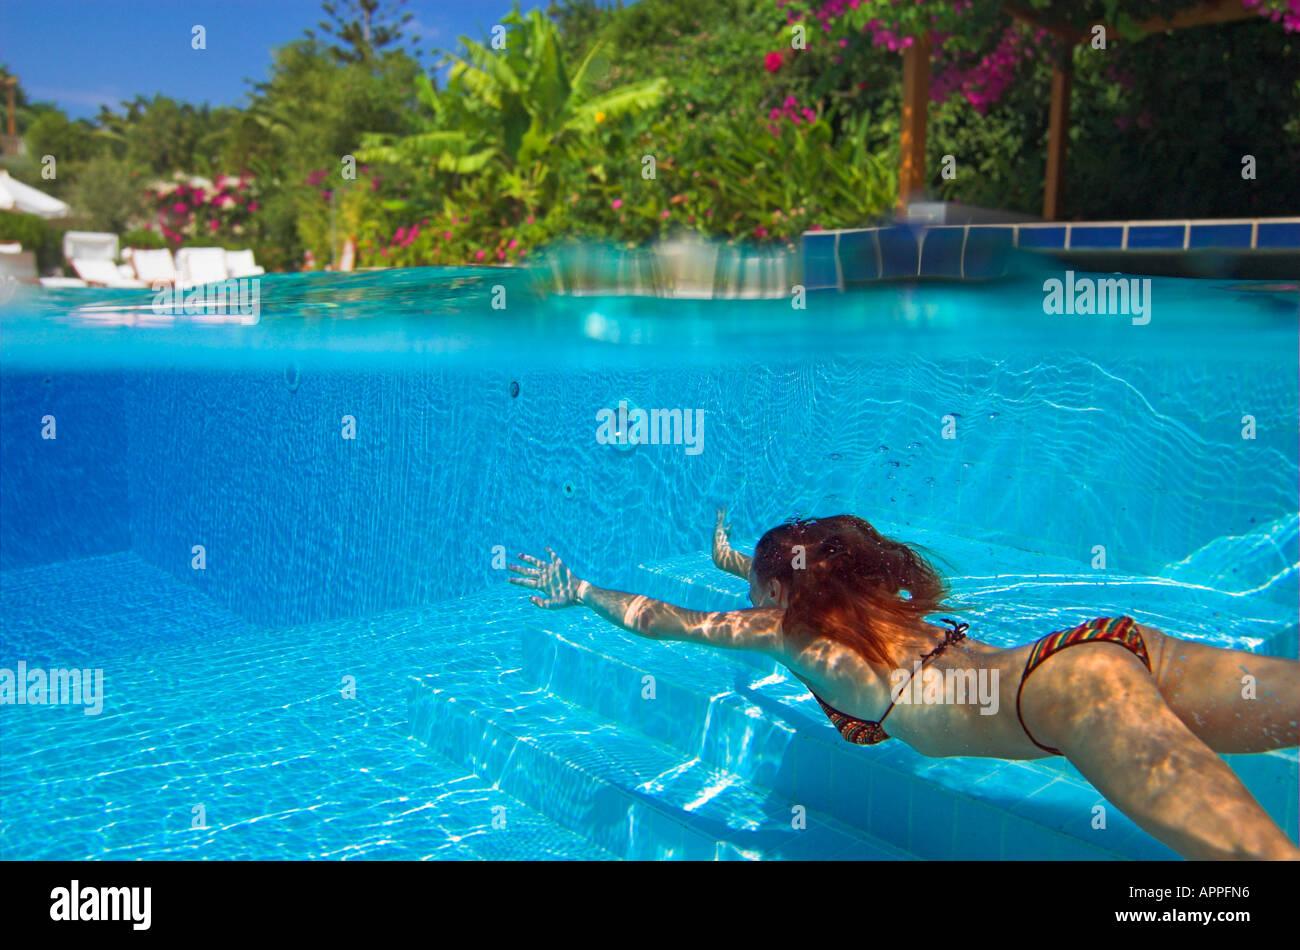 woman in bikini diving underwater in swimming pool hotel above water stock photo 9052565 alamy